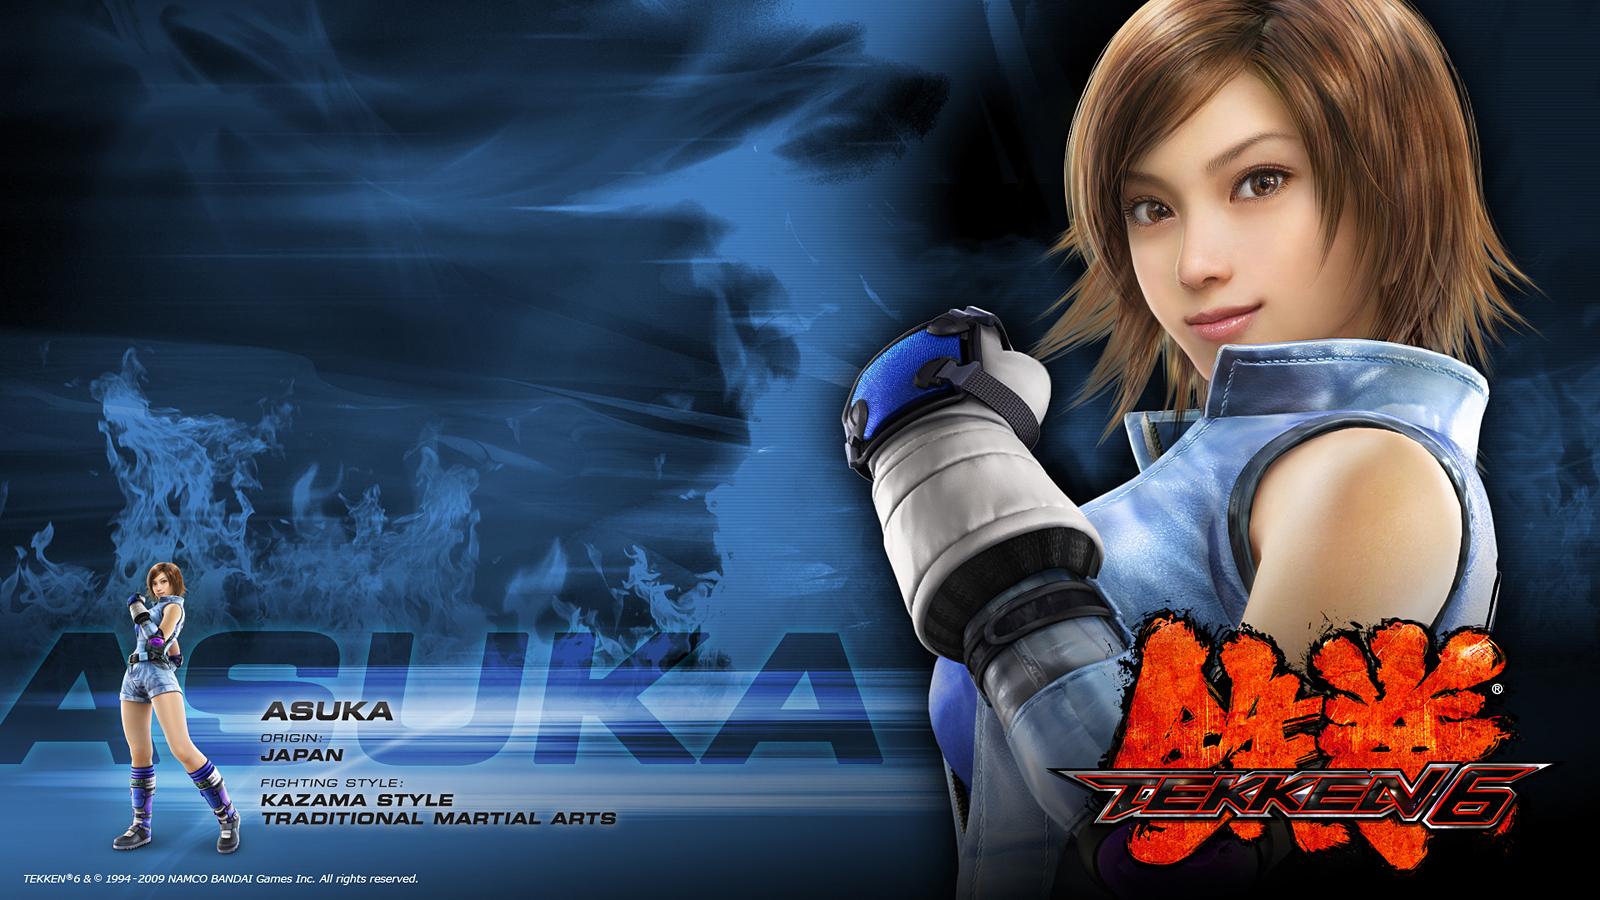 Tekken 6 Asuka Kazama Wallpaper 1600x900 61612 Wallpaperup